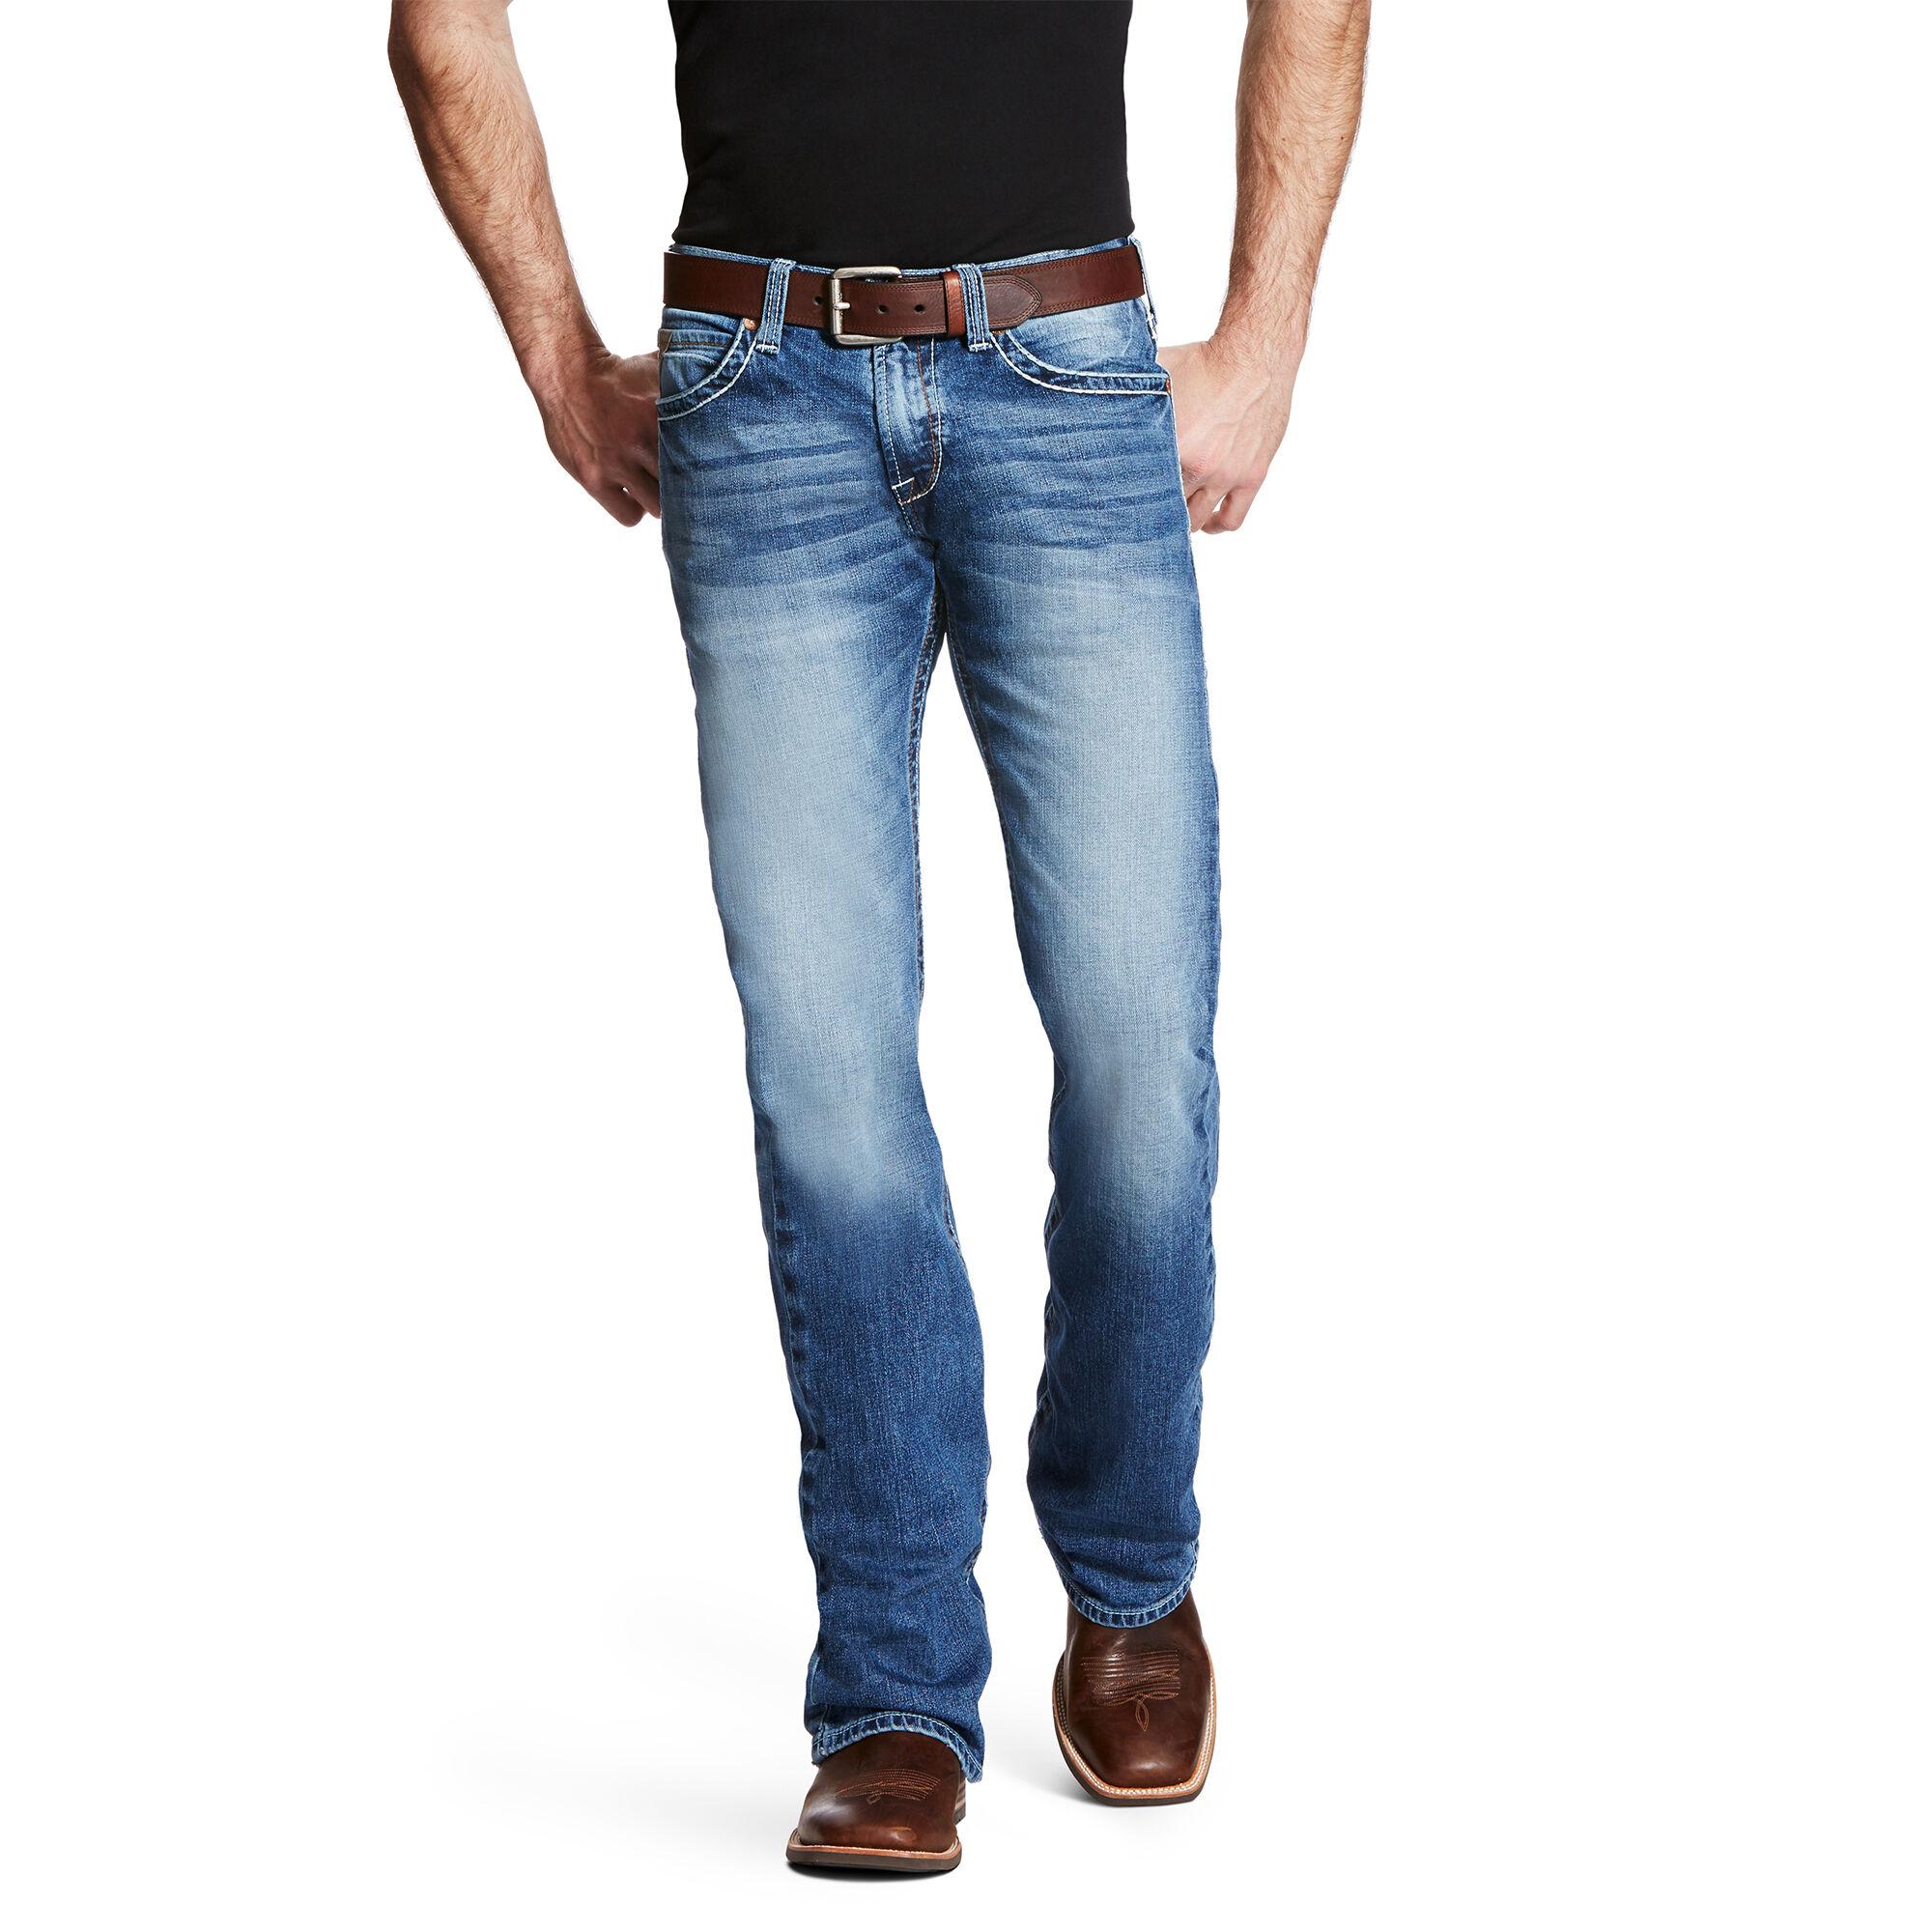 M7 Rocker Boot Jagger Stretch Boot Cut Jean